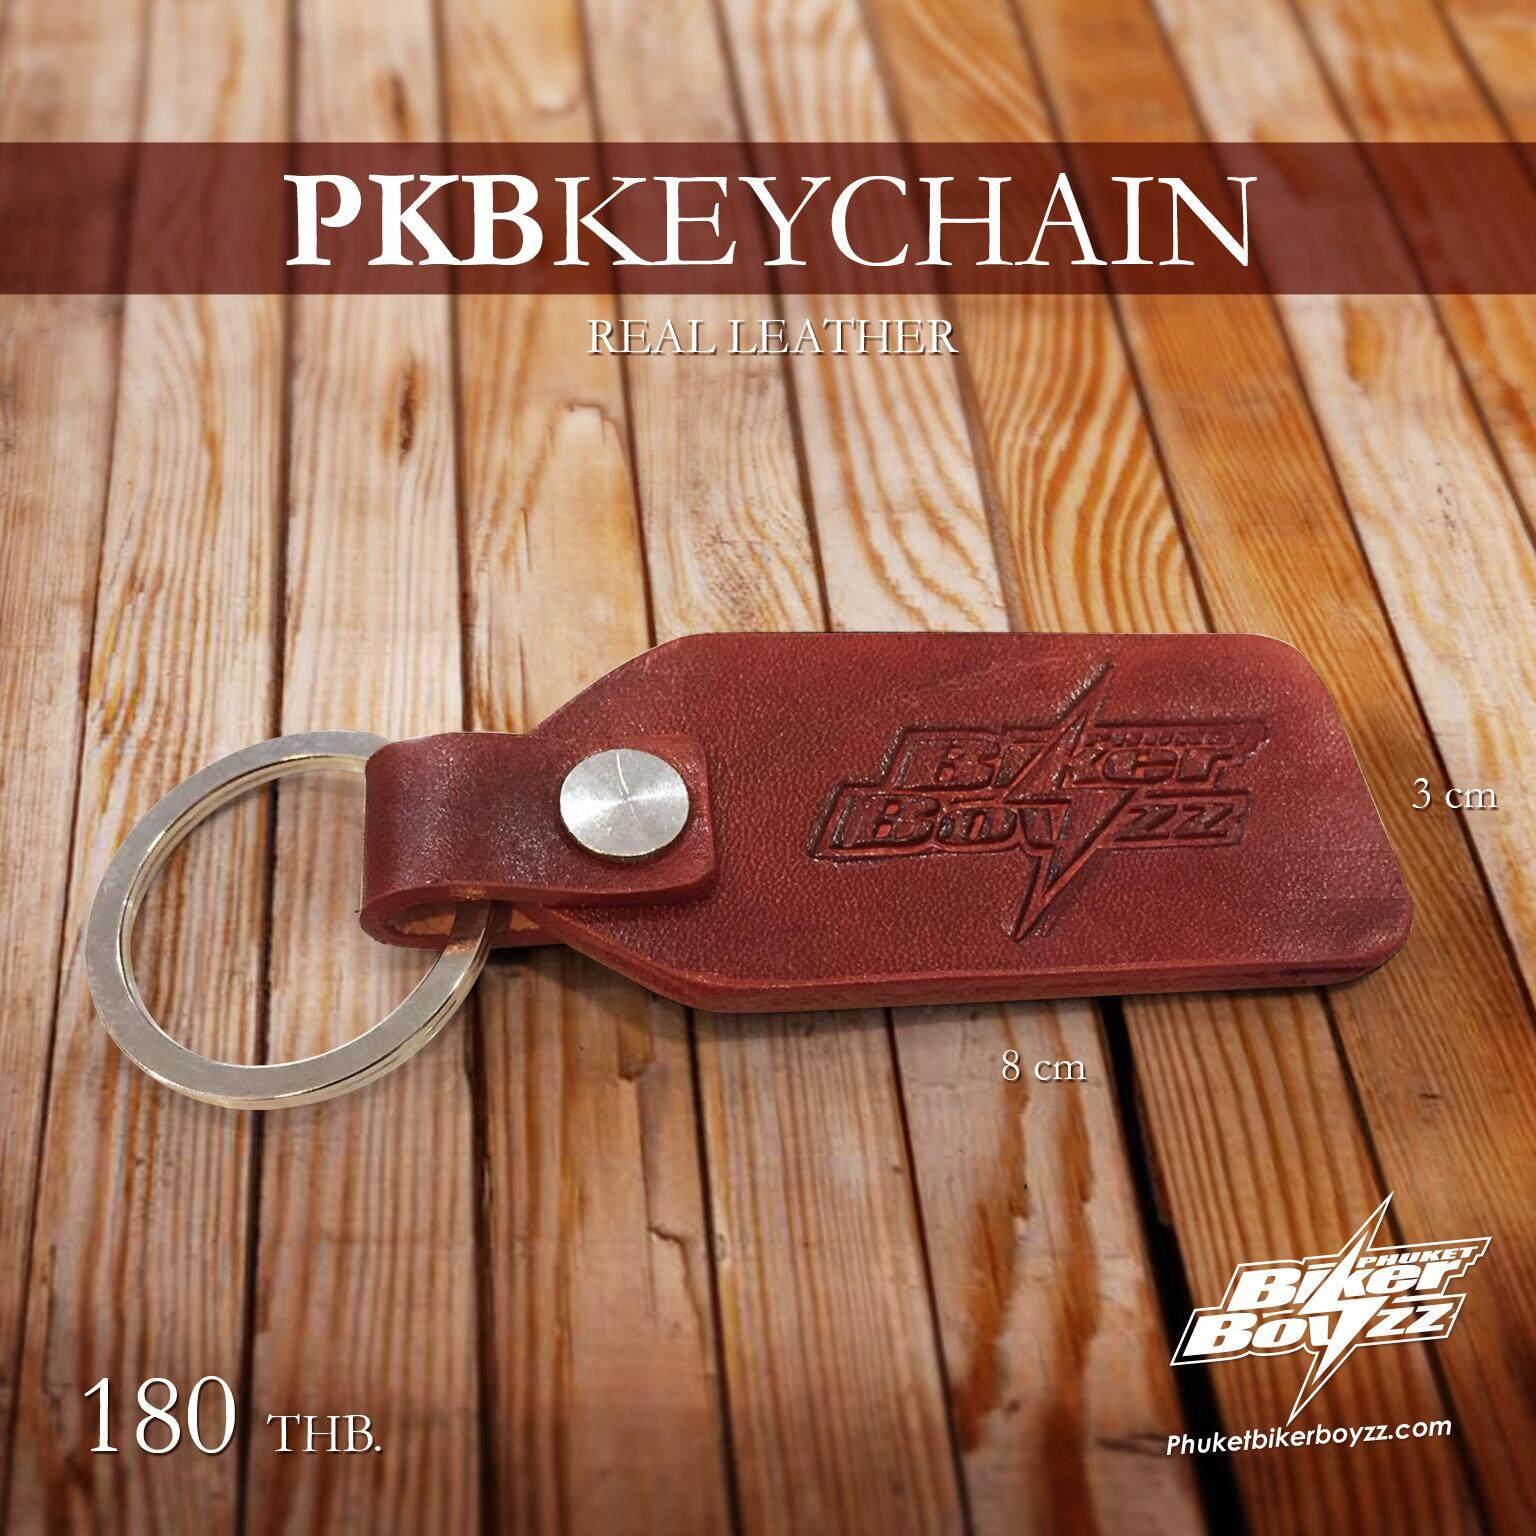 Keychain Genuine Leather Phuketbikerboyzz พวงกุญแจหนังแท้ ภูเก็ตไบเกอร์บอยซ์ By Bikerboyzz Design.